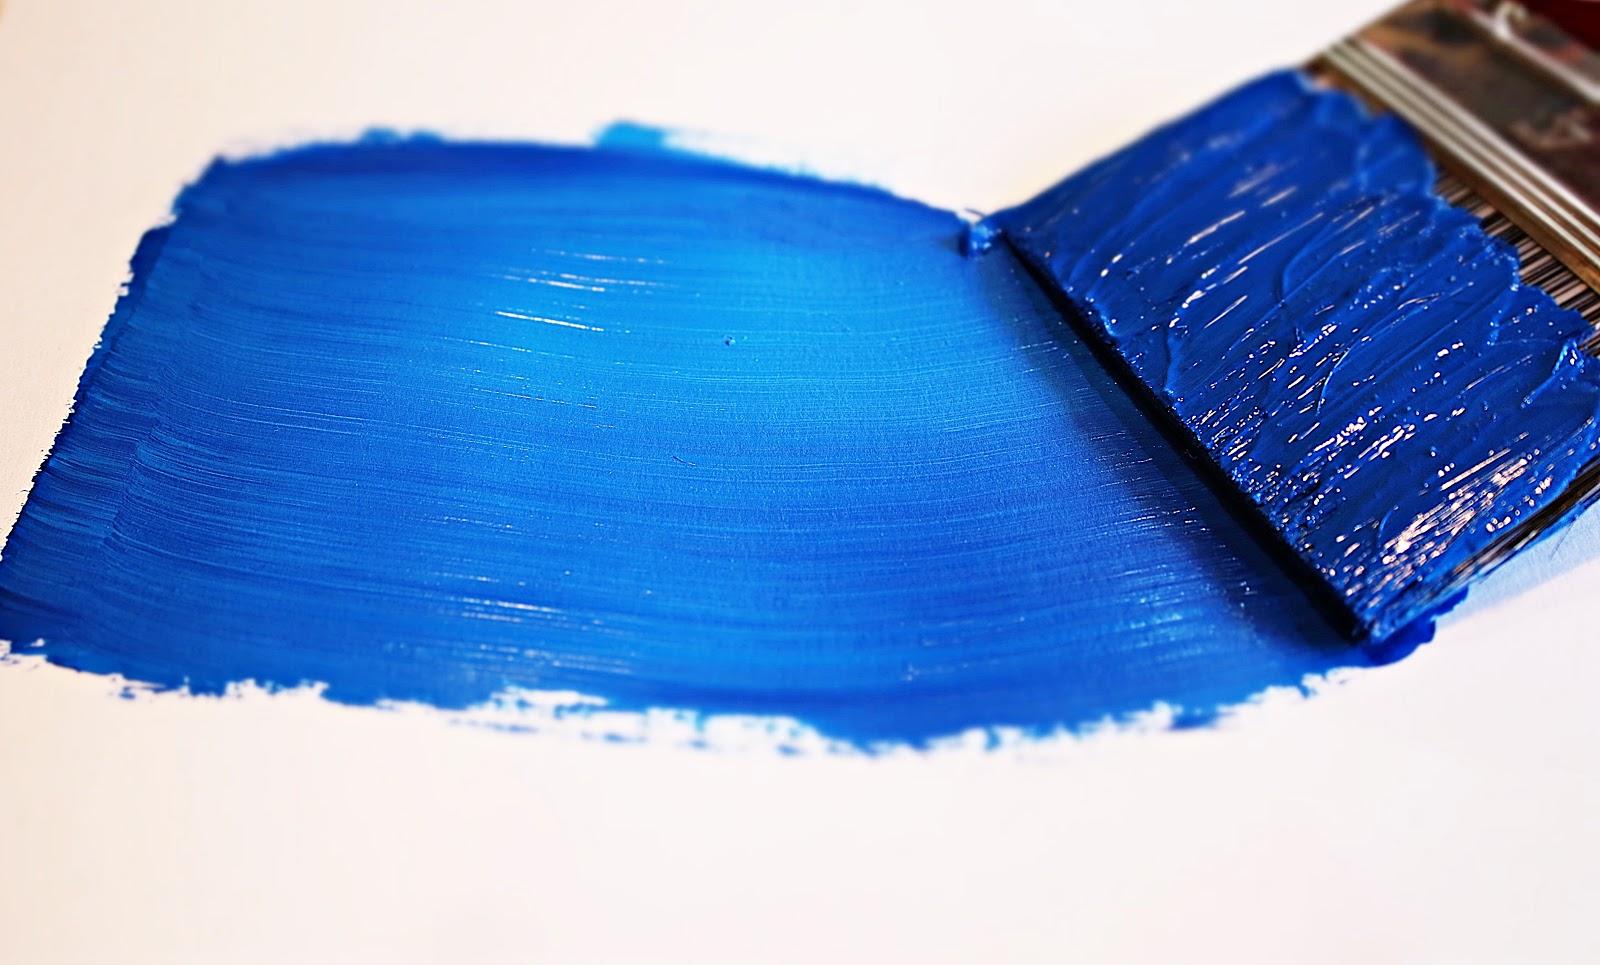 A paintbrush spreads blue paint across a bare white medium.